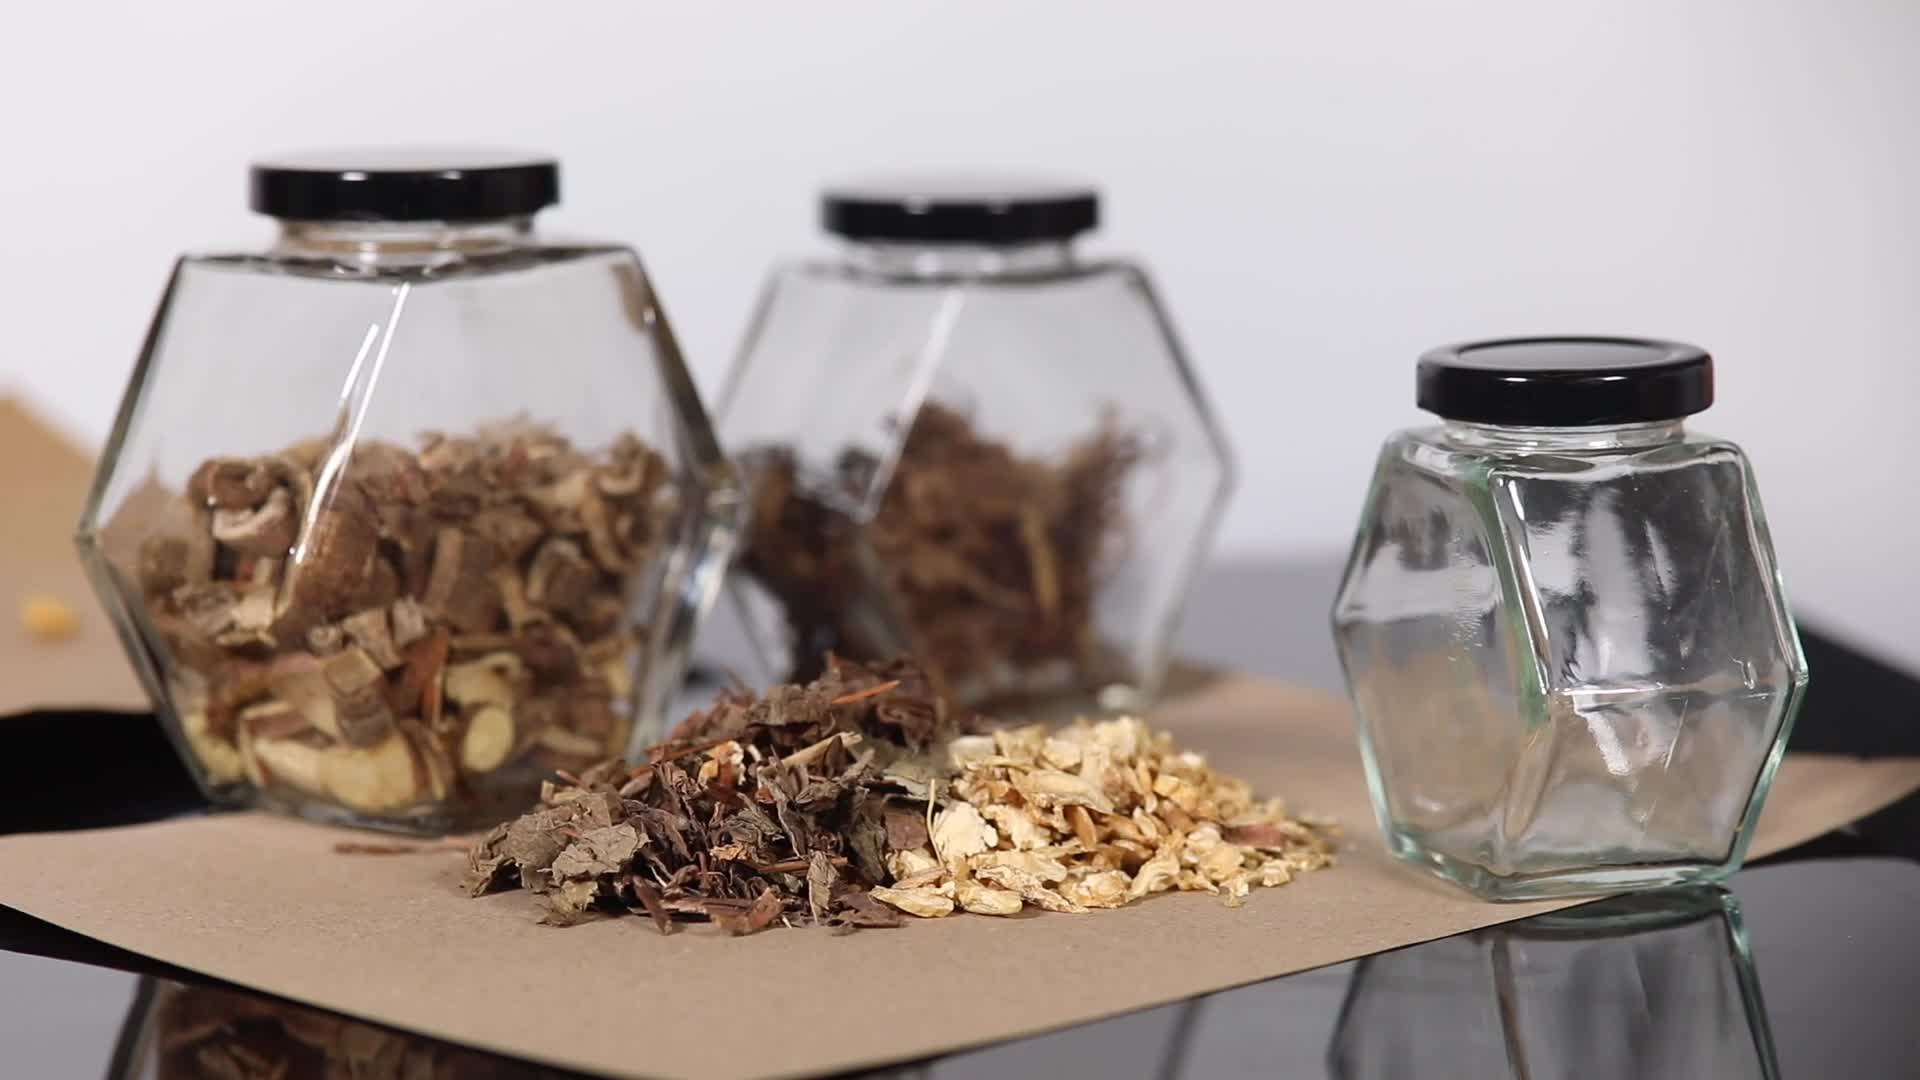 Listo para enviar tapa de madera de grado alimenticio 430ml gran oferta tarro de miel de vidrio hexagonal